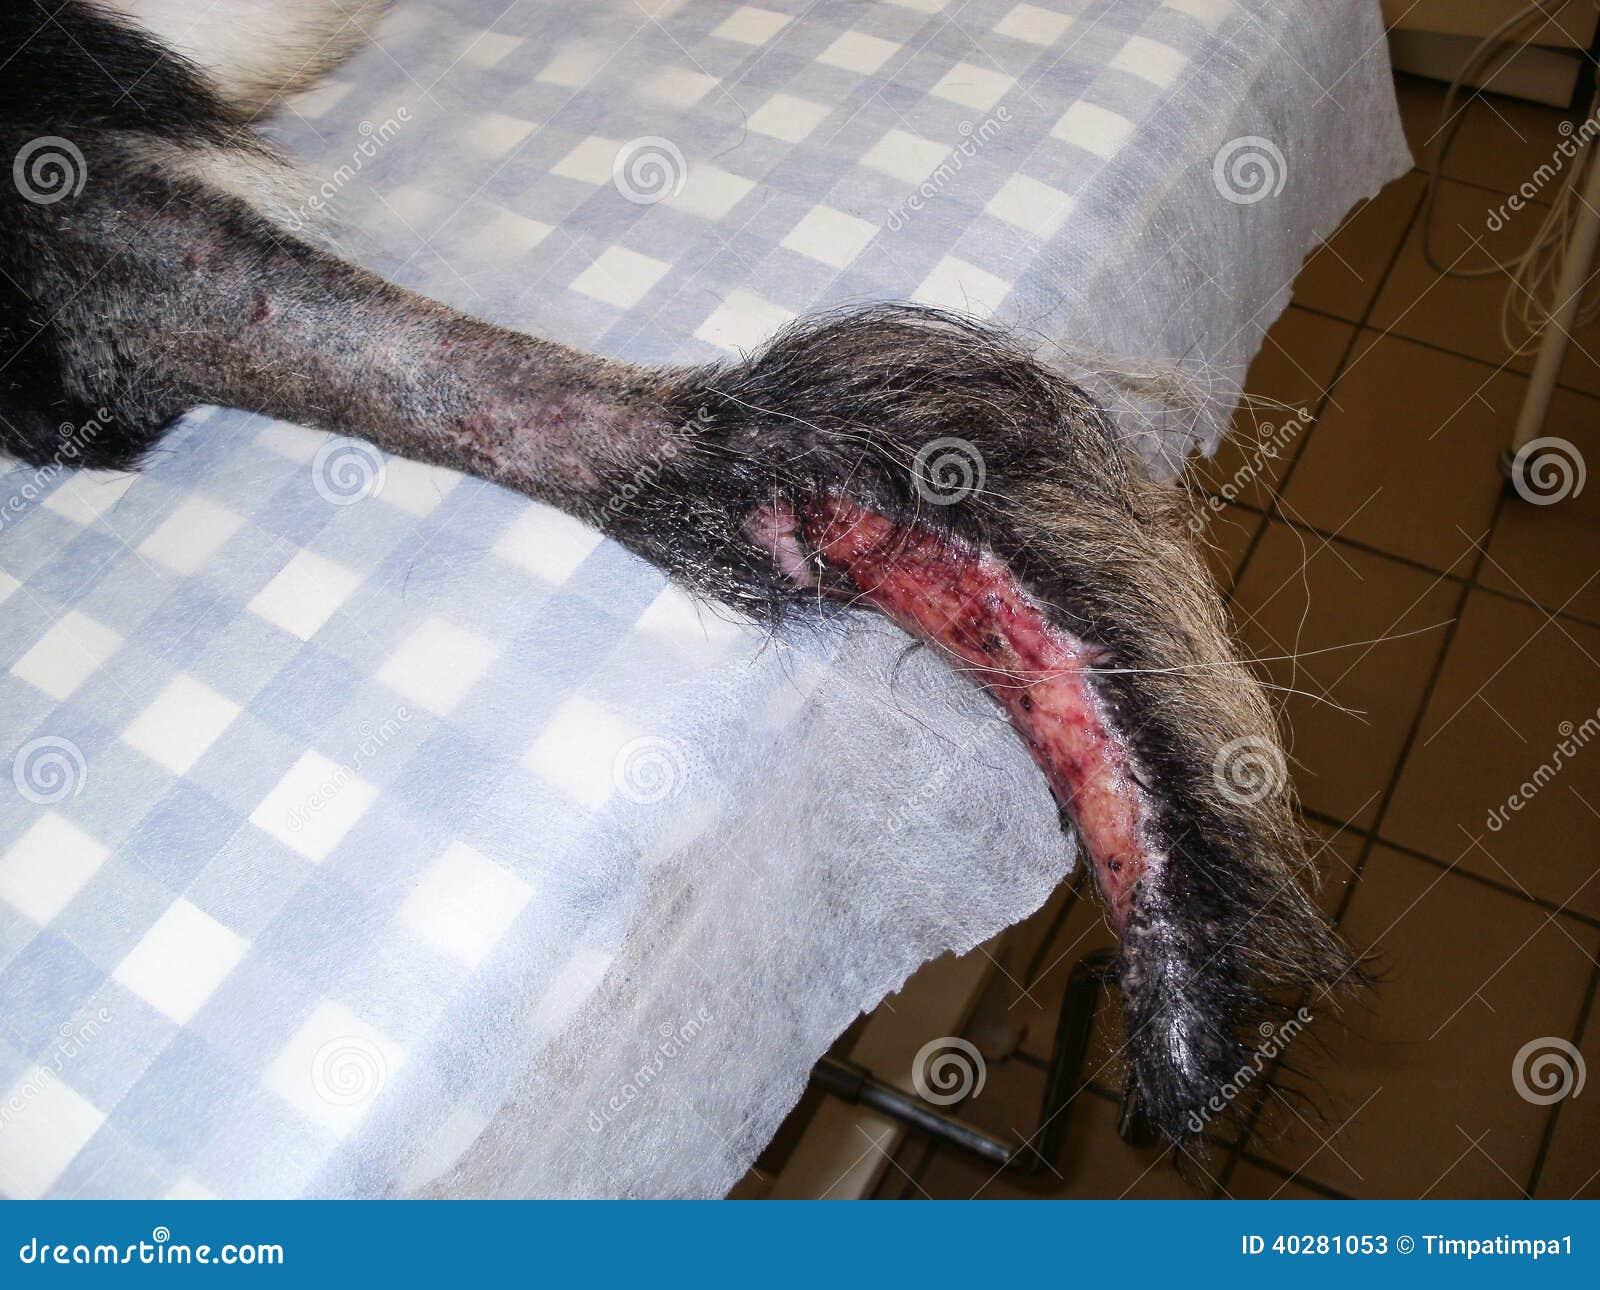 Заживление рана на кабеле собакой чабана